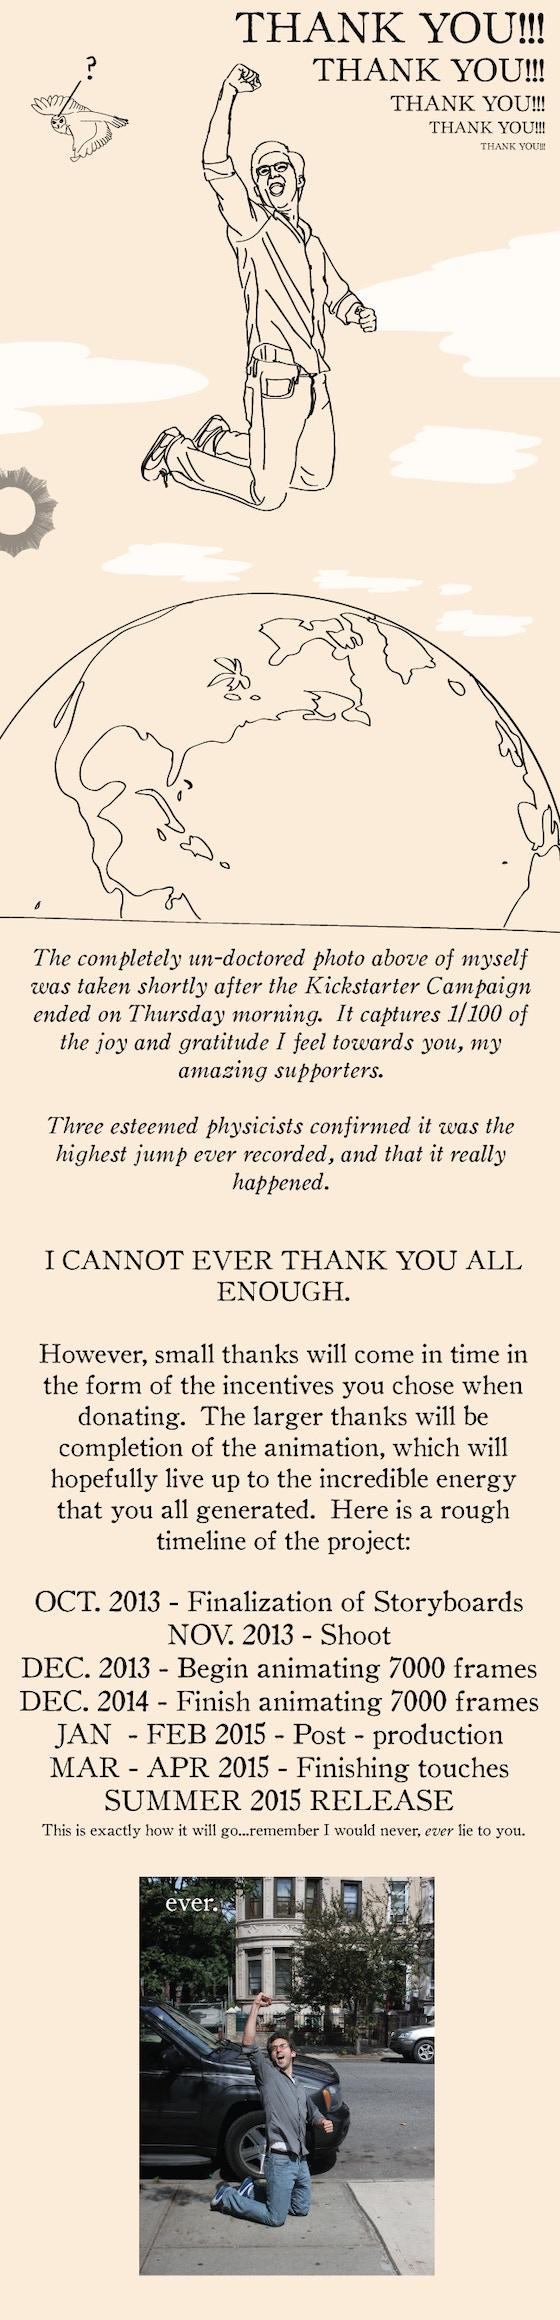 Easy Pieces The Animation (Round 2) by Neil Dvorak » Thank